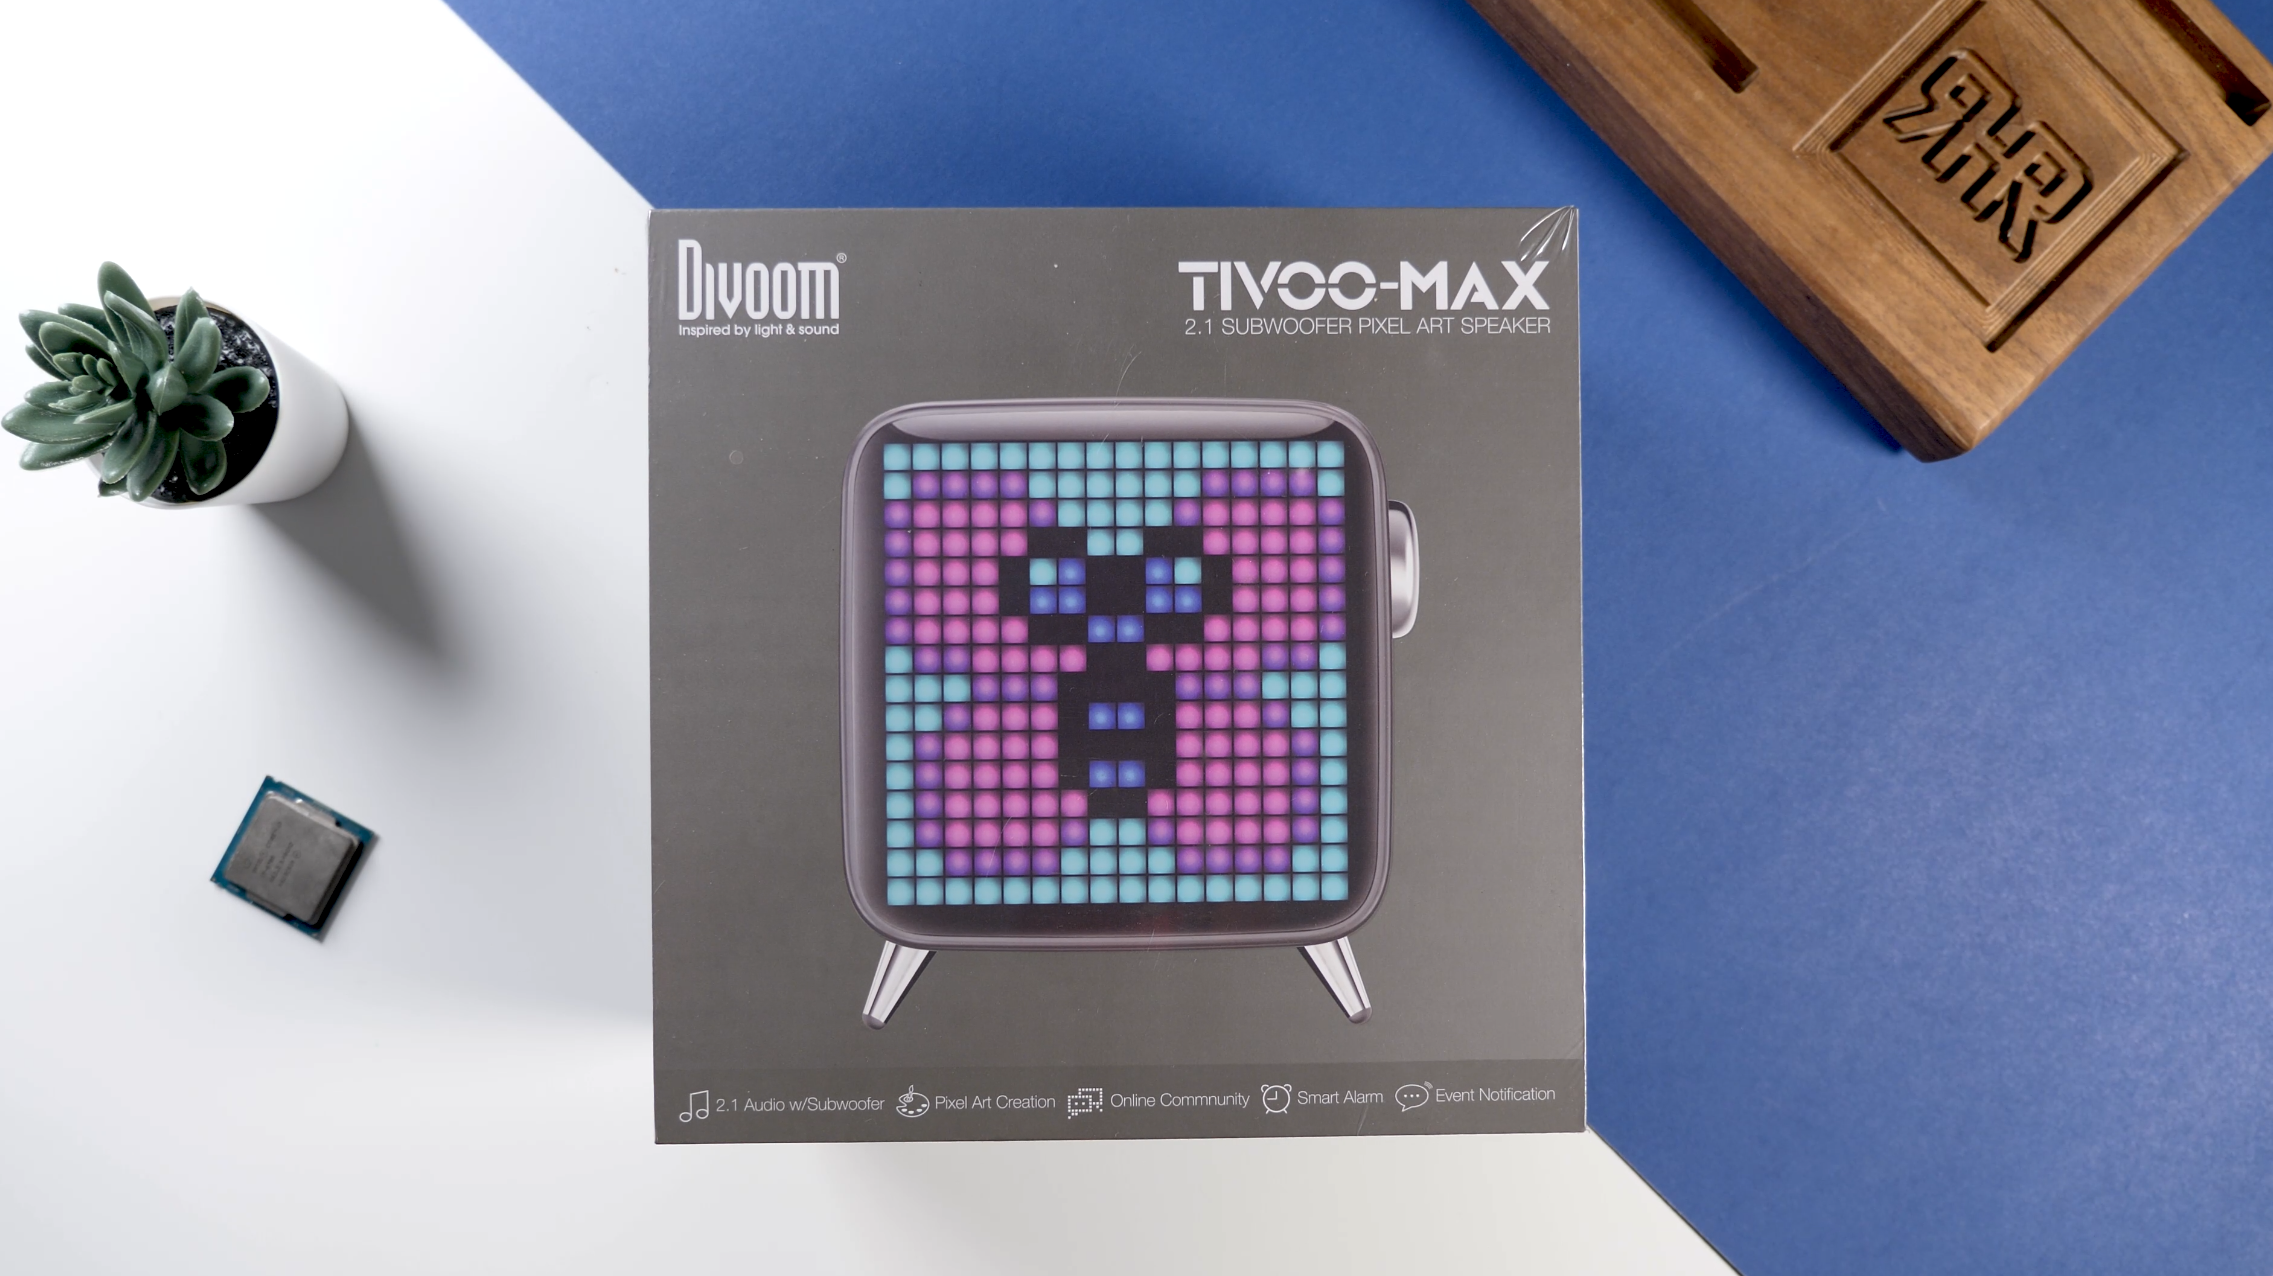 Divoom Tivoo Max Unboxing - Divoom Tivoo Max Review